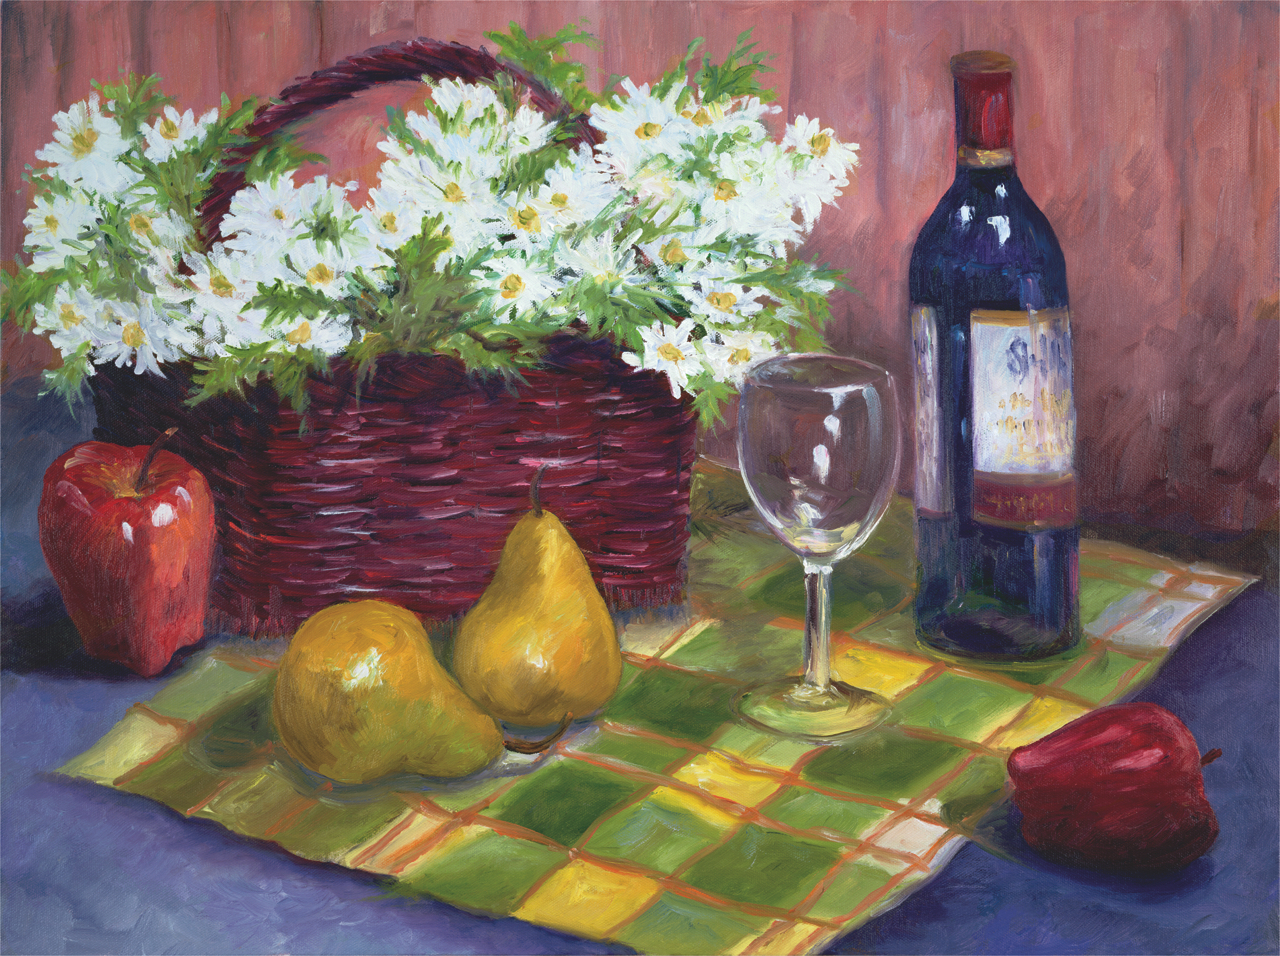 Wine and Daisies